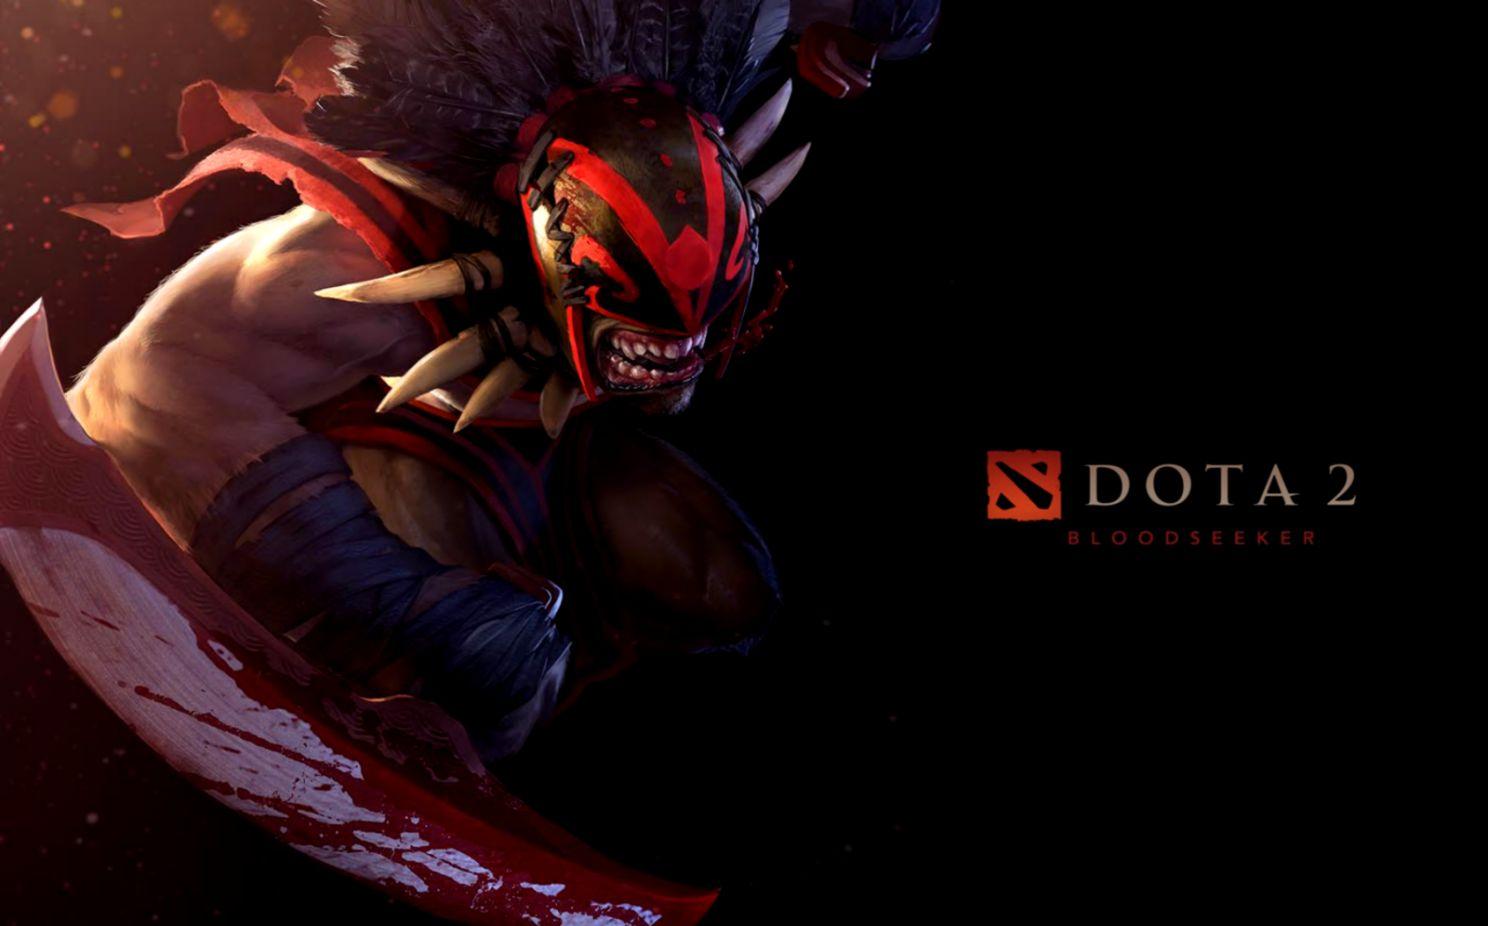 Dota 2 Bloodseeker Images Wallpaper | Mega Wallpapers